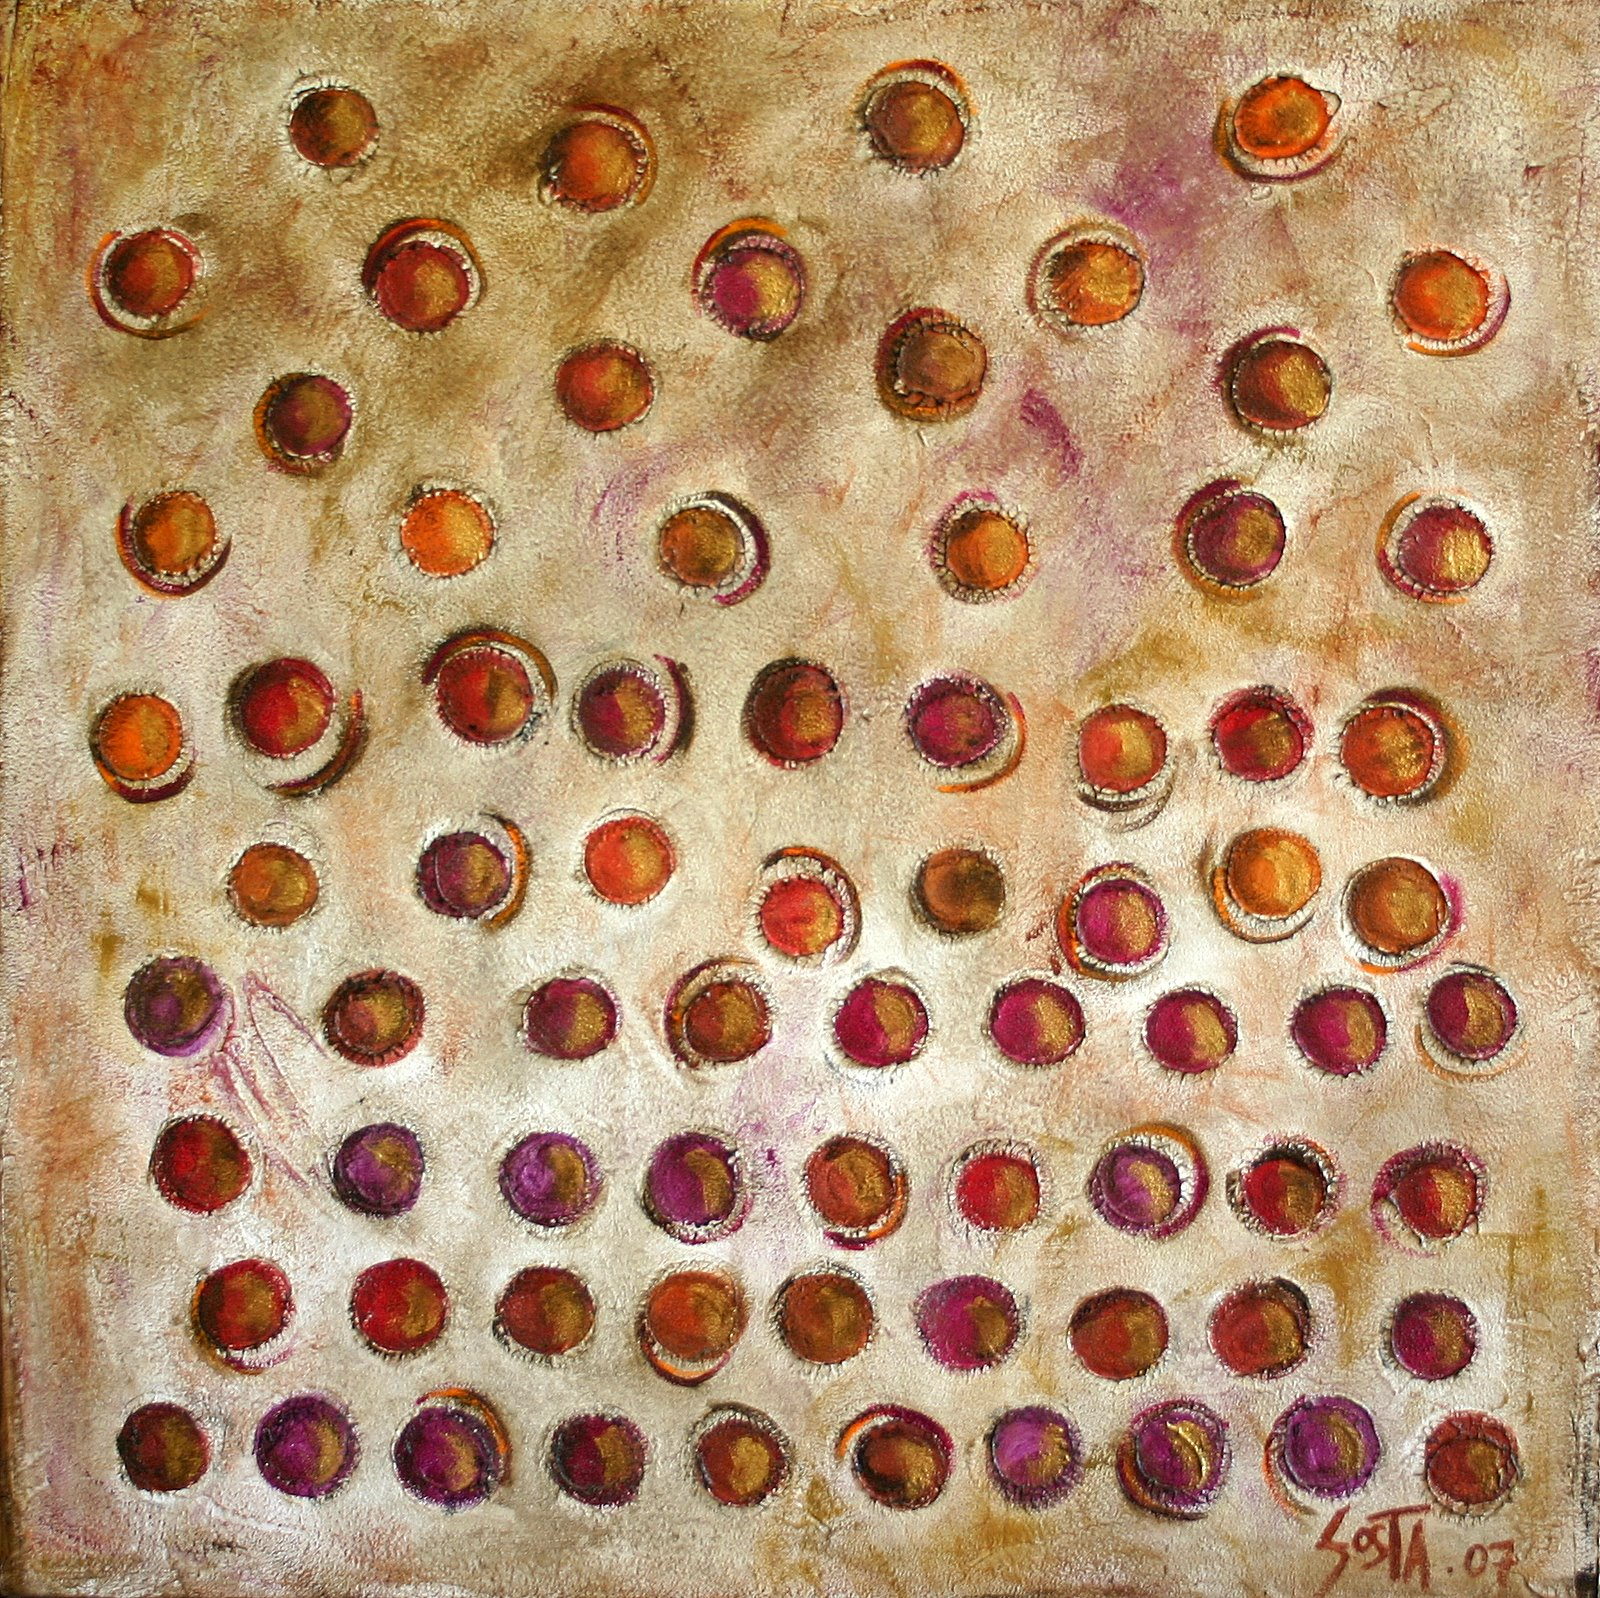 Tableau Contemporain, Ebullition. Sophie Costa, artiste peintre.